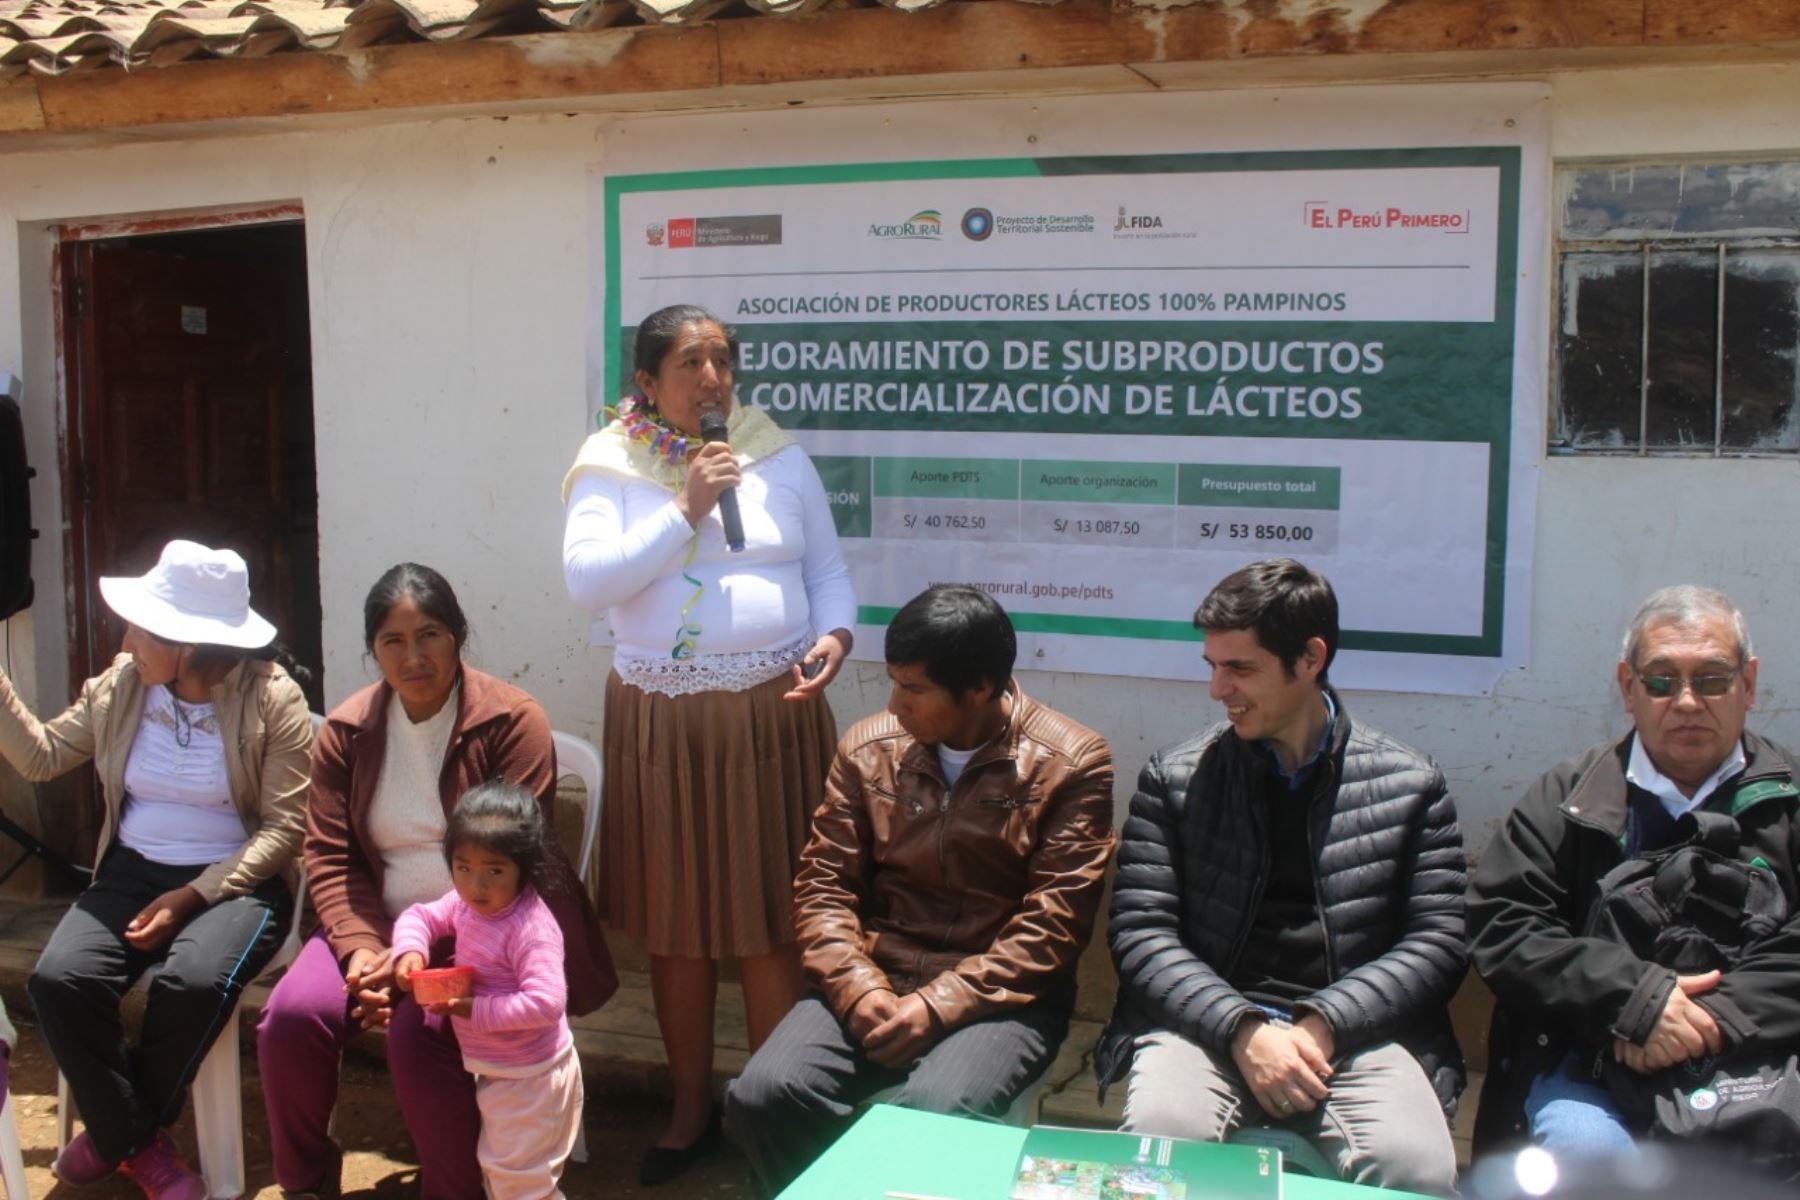 Ministerio de Agricultura resalta logros alcanzados por pequeños productores rurales de Huancavelica. ANDINA/Difusión